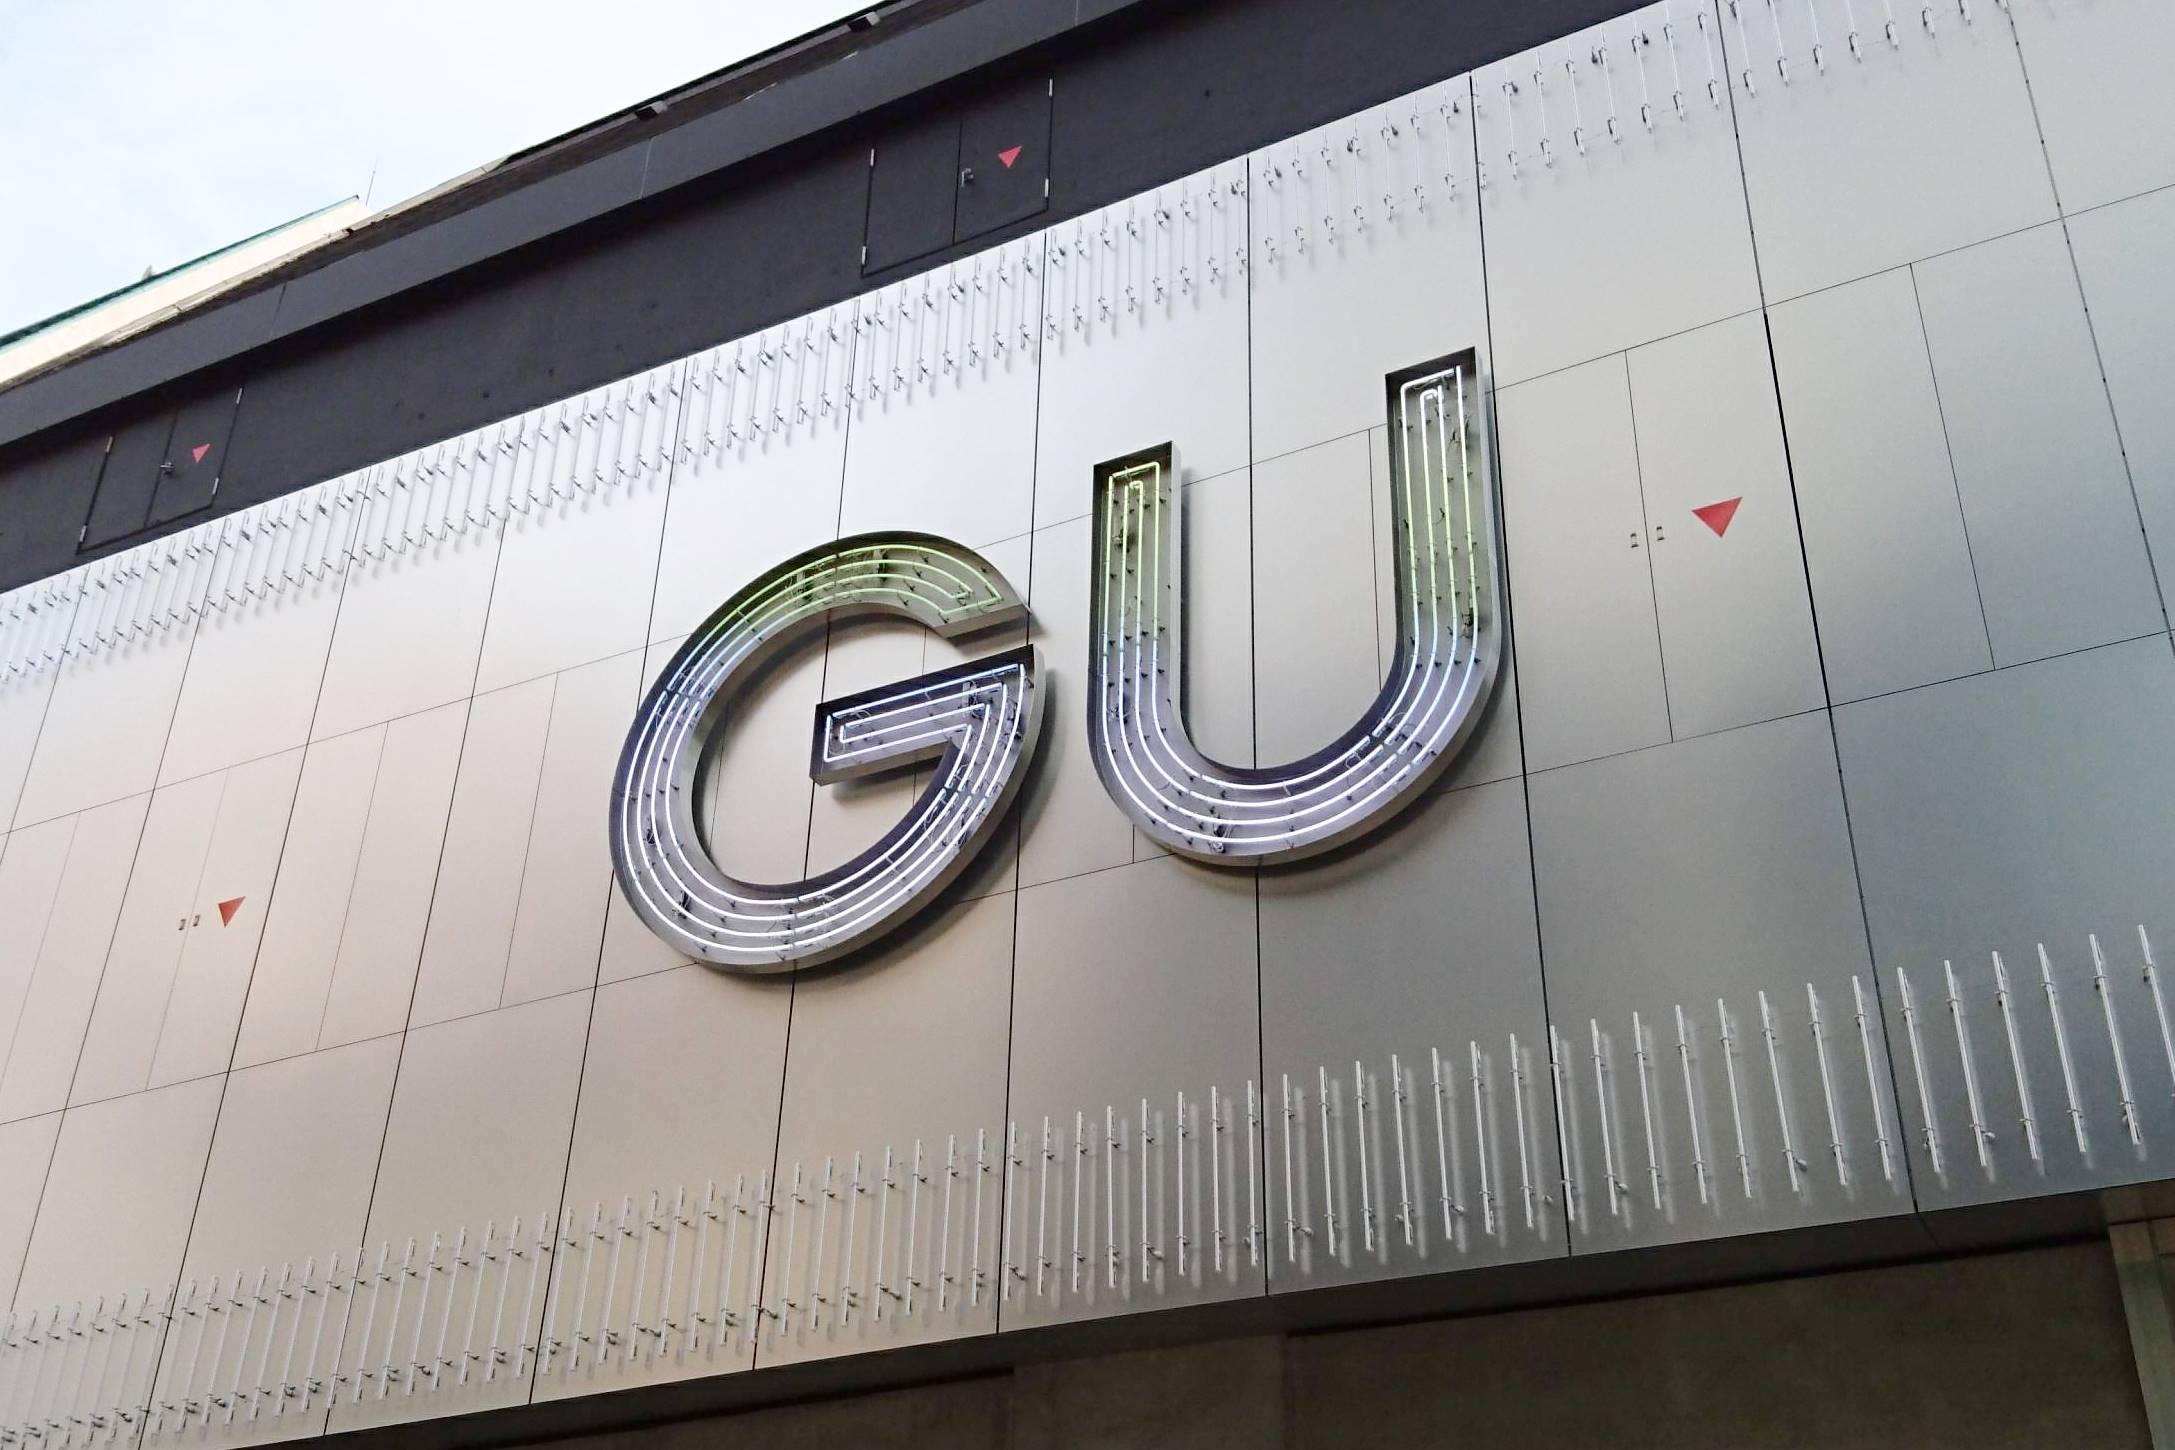 【GU】ミーハー女子必見!夏コーデを楽しむ旬なアイテム4選